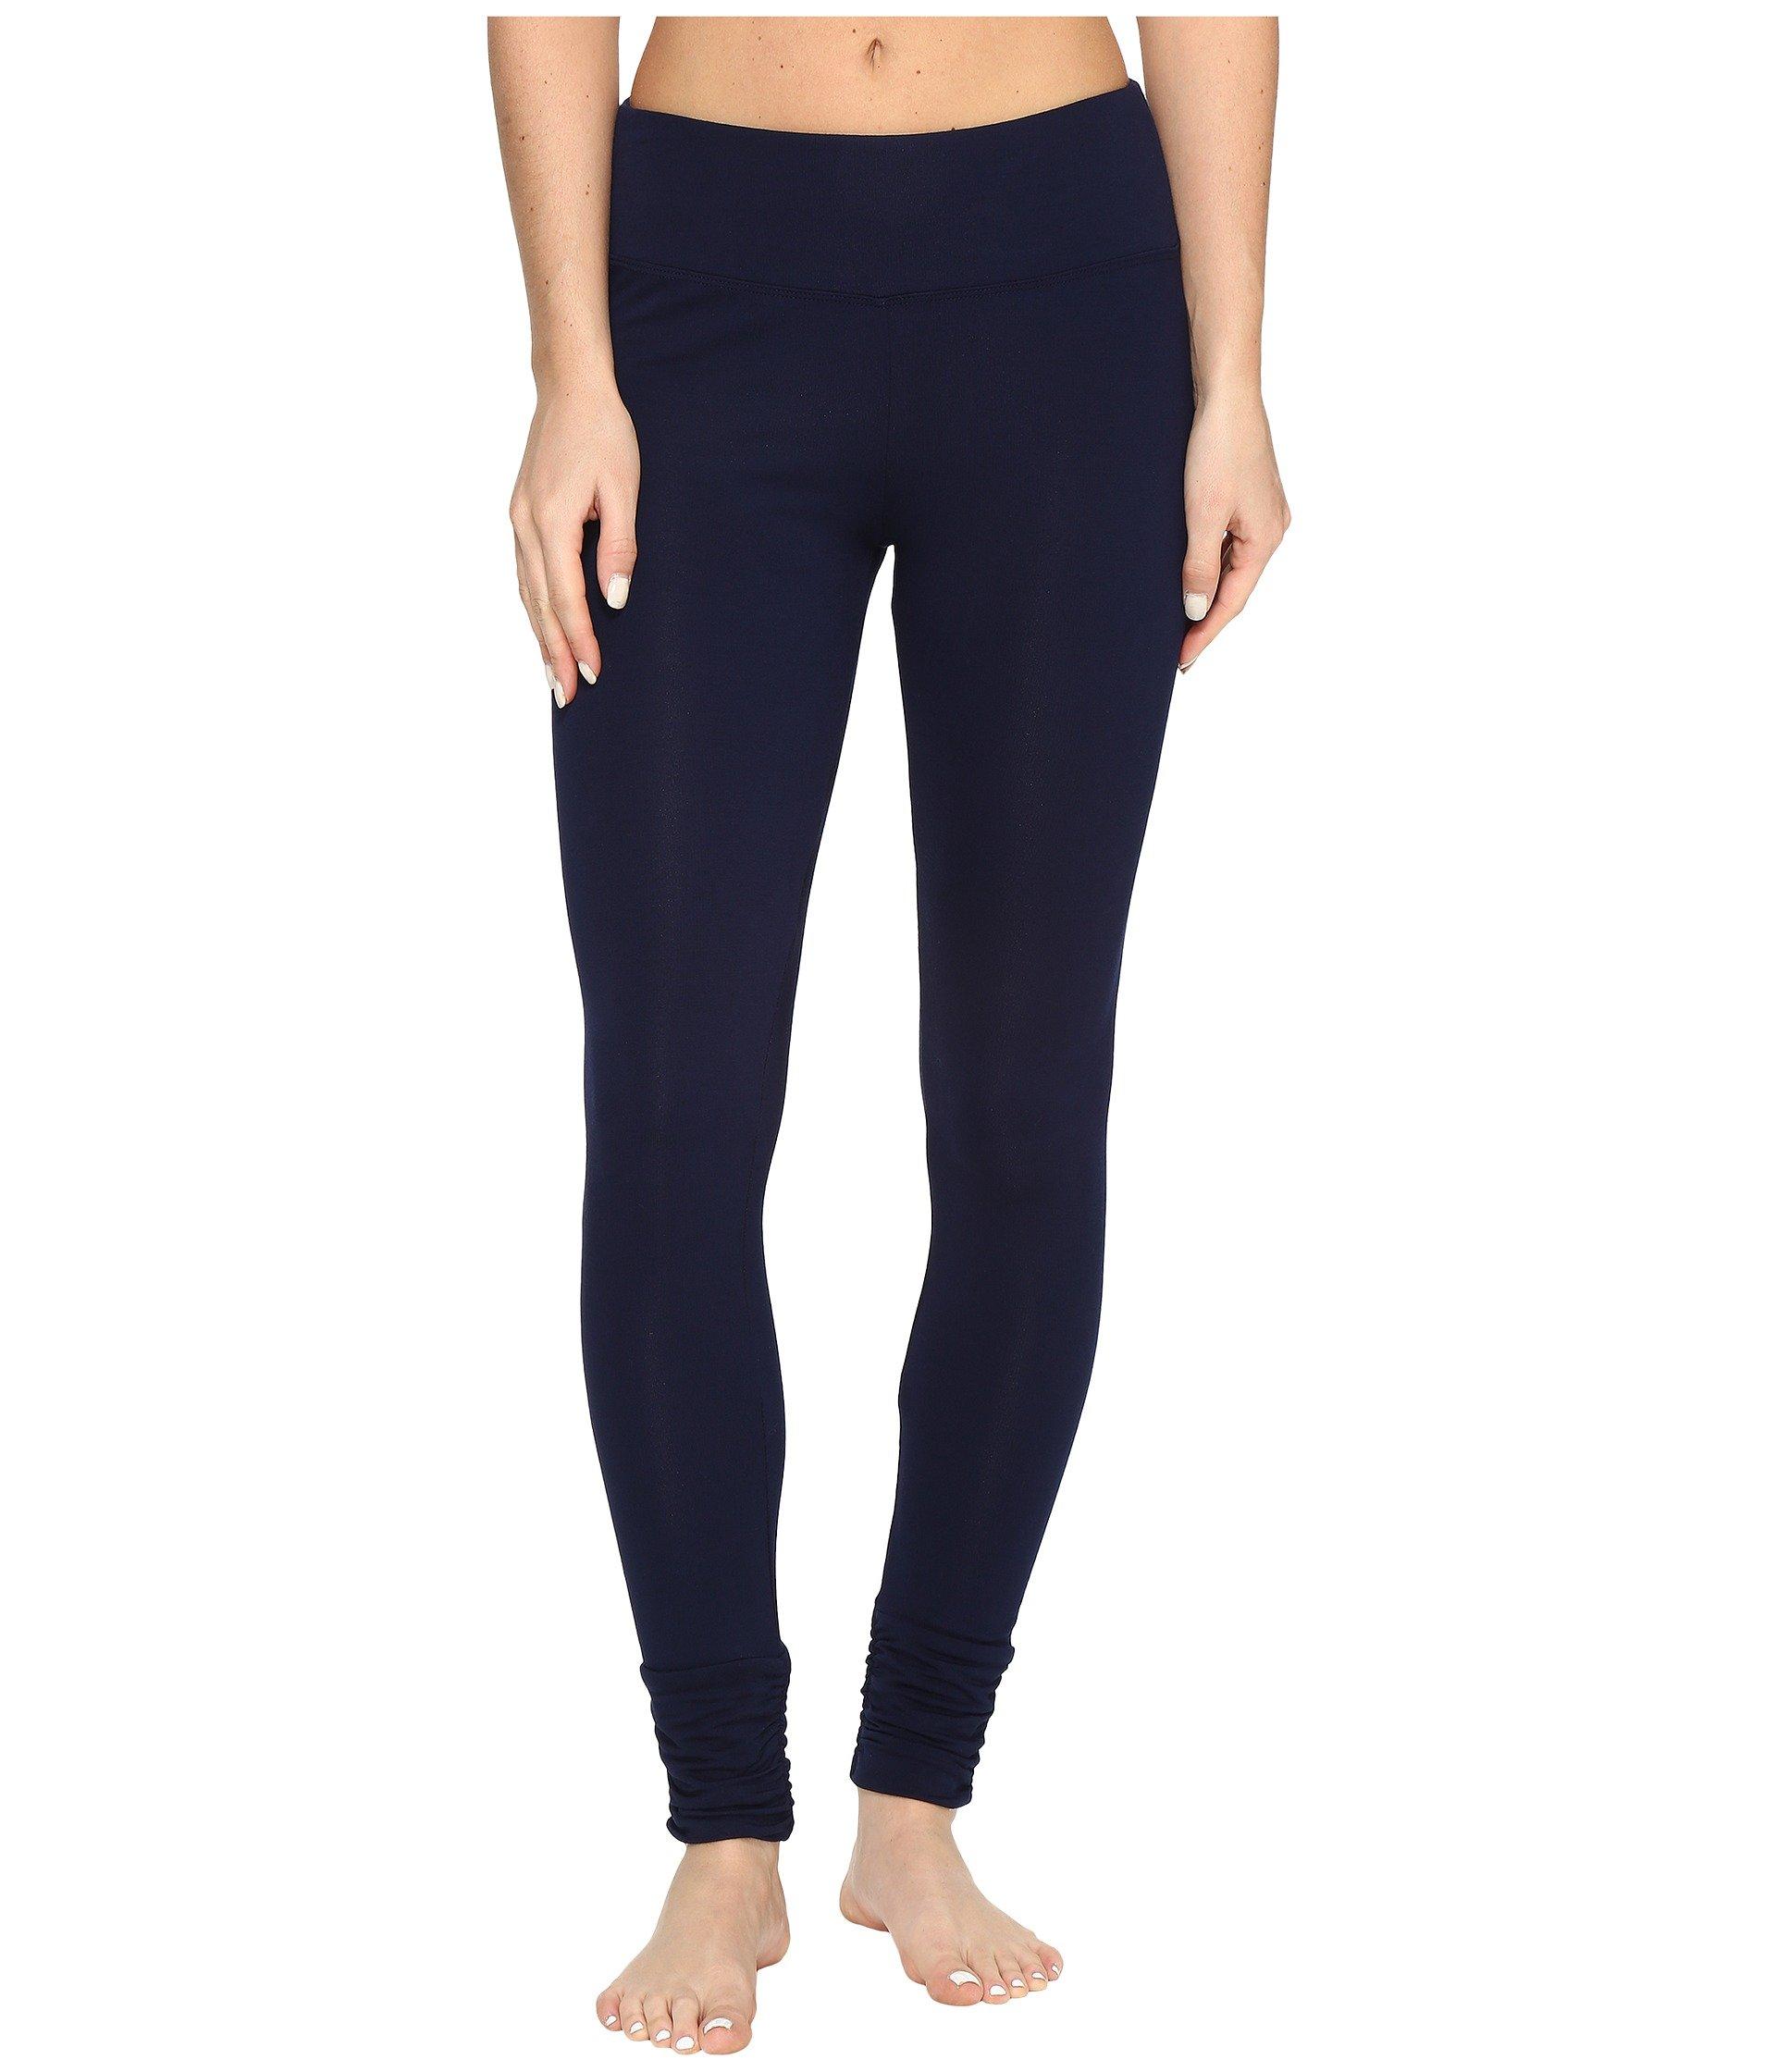 Pantalón de Pijama para Mujer UGG Rainey Leggings  + UGG en VeoyCompro.net